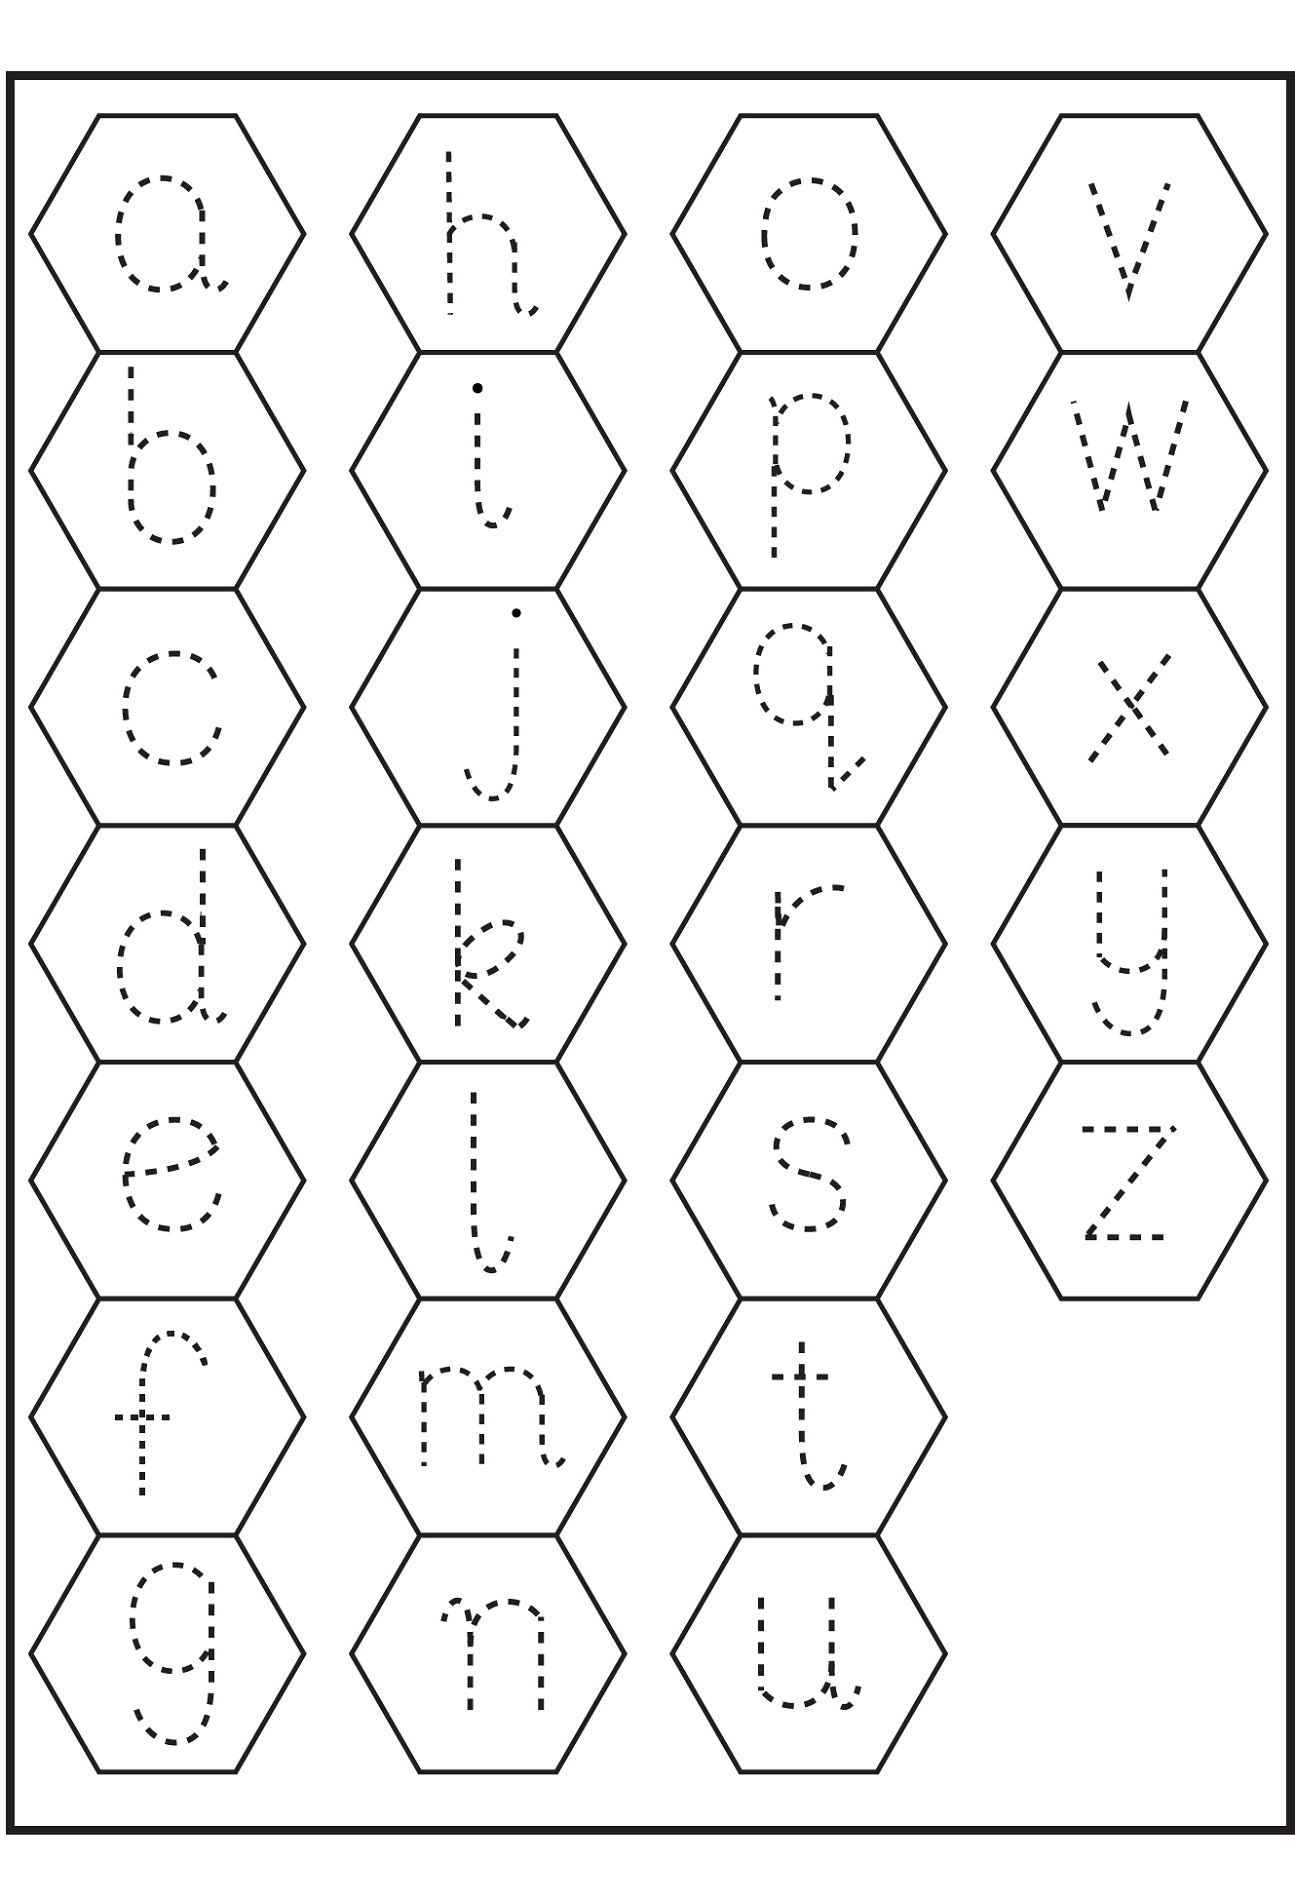 trace letter d for kids